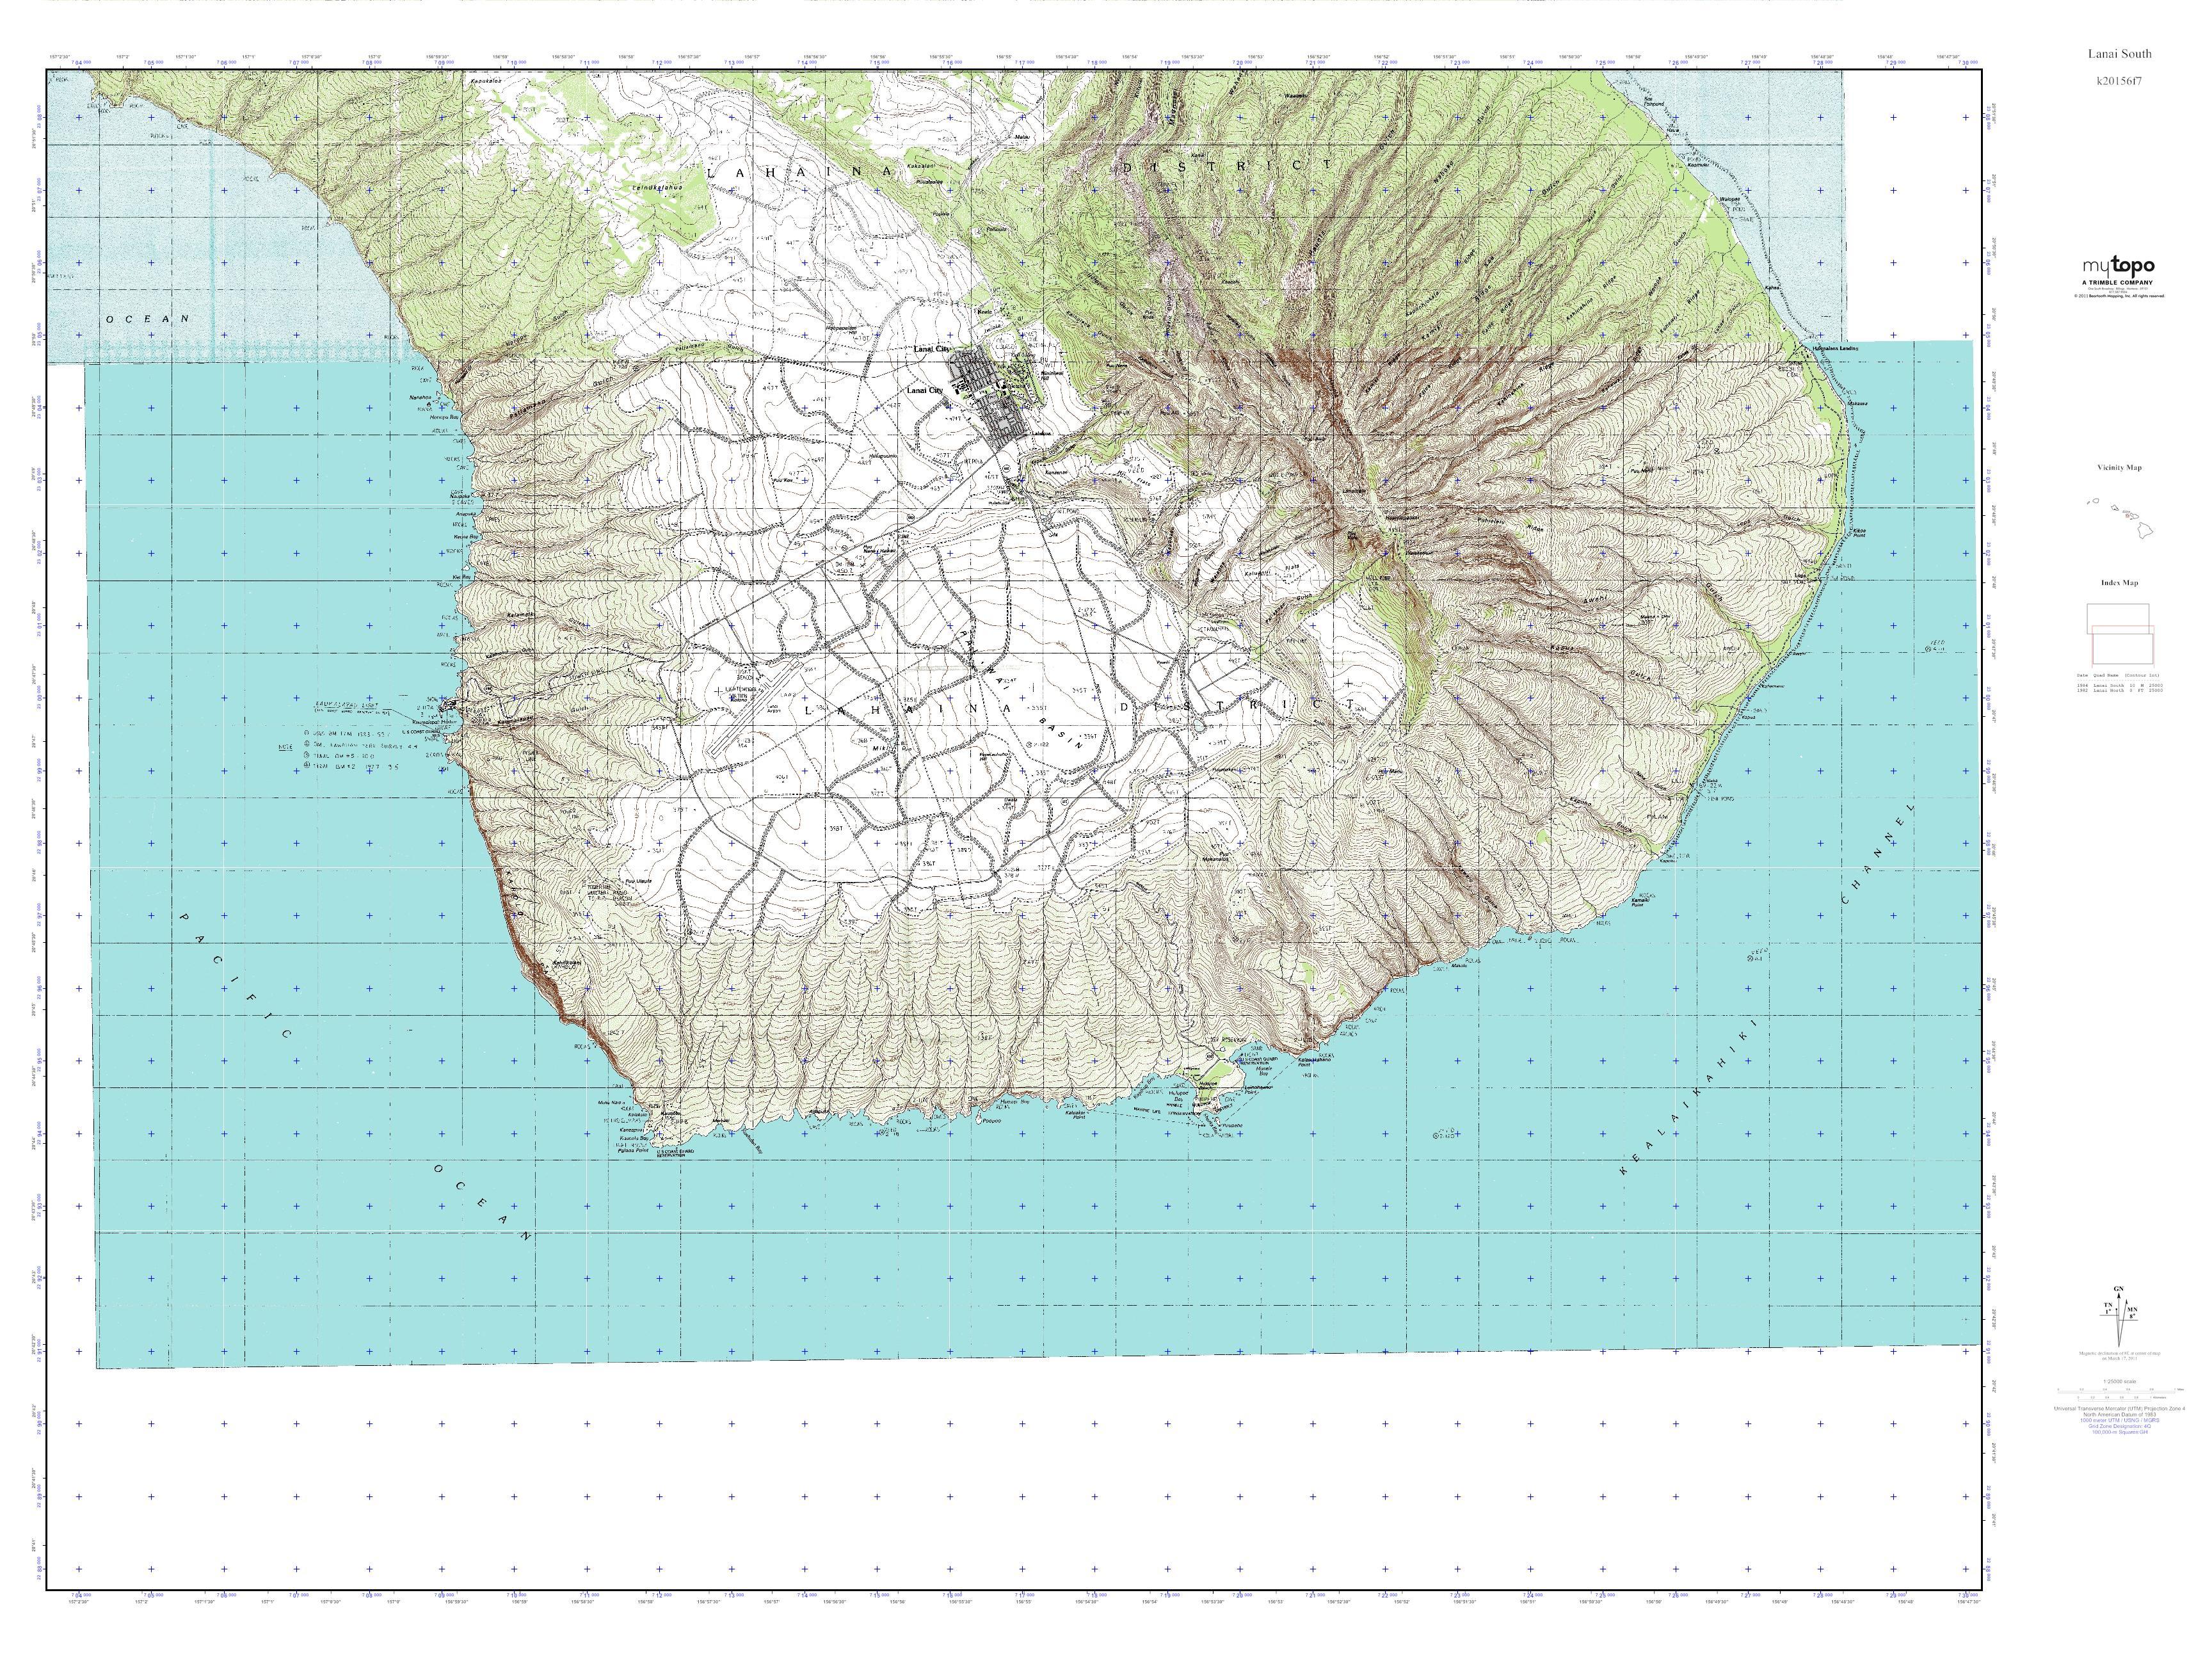 MyTopo Lanai South, Hawaii USGS Quad Topo Map